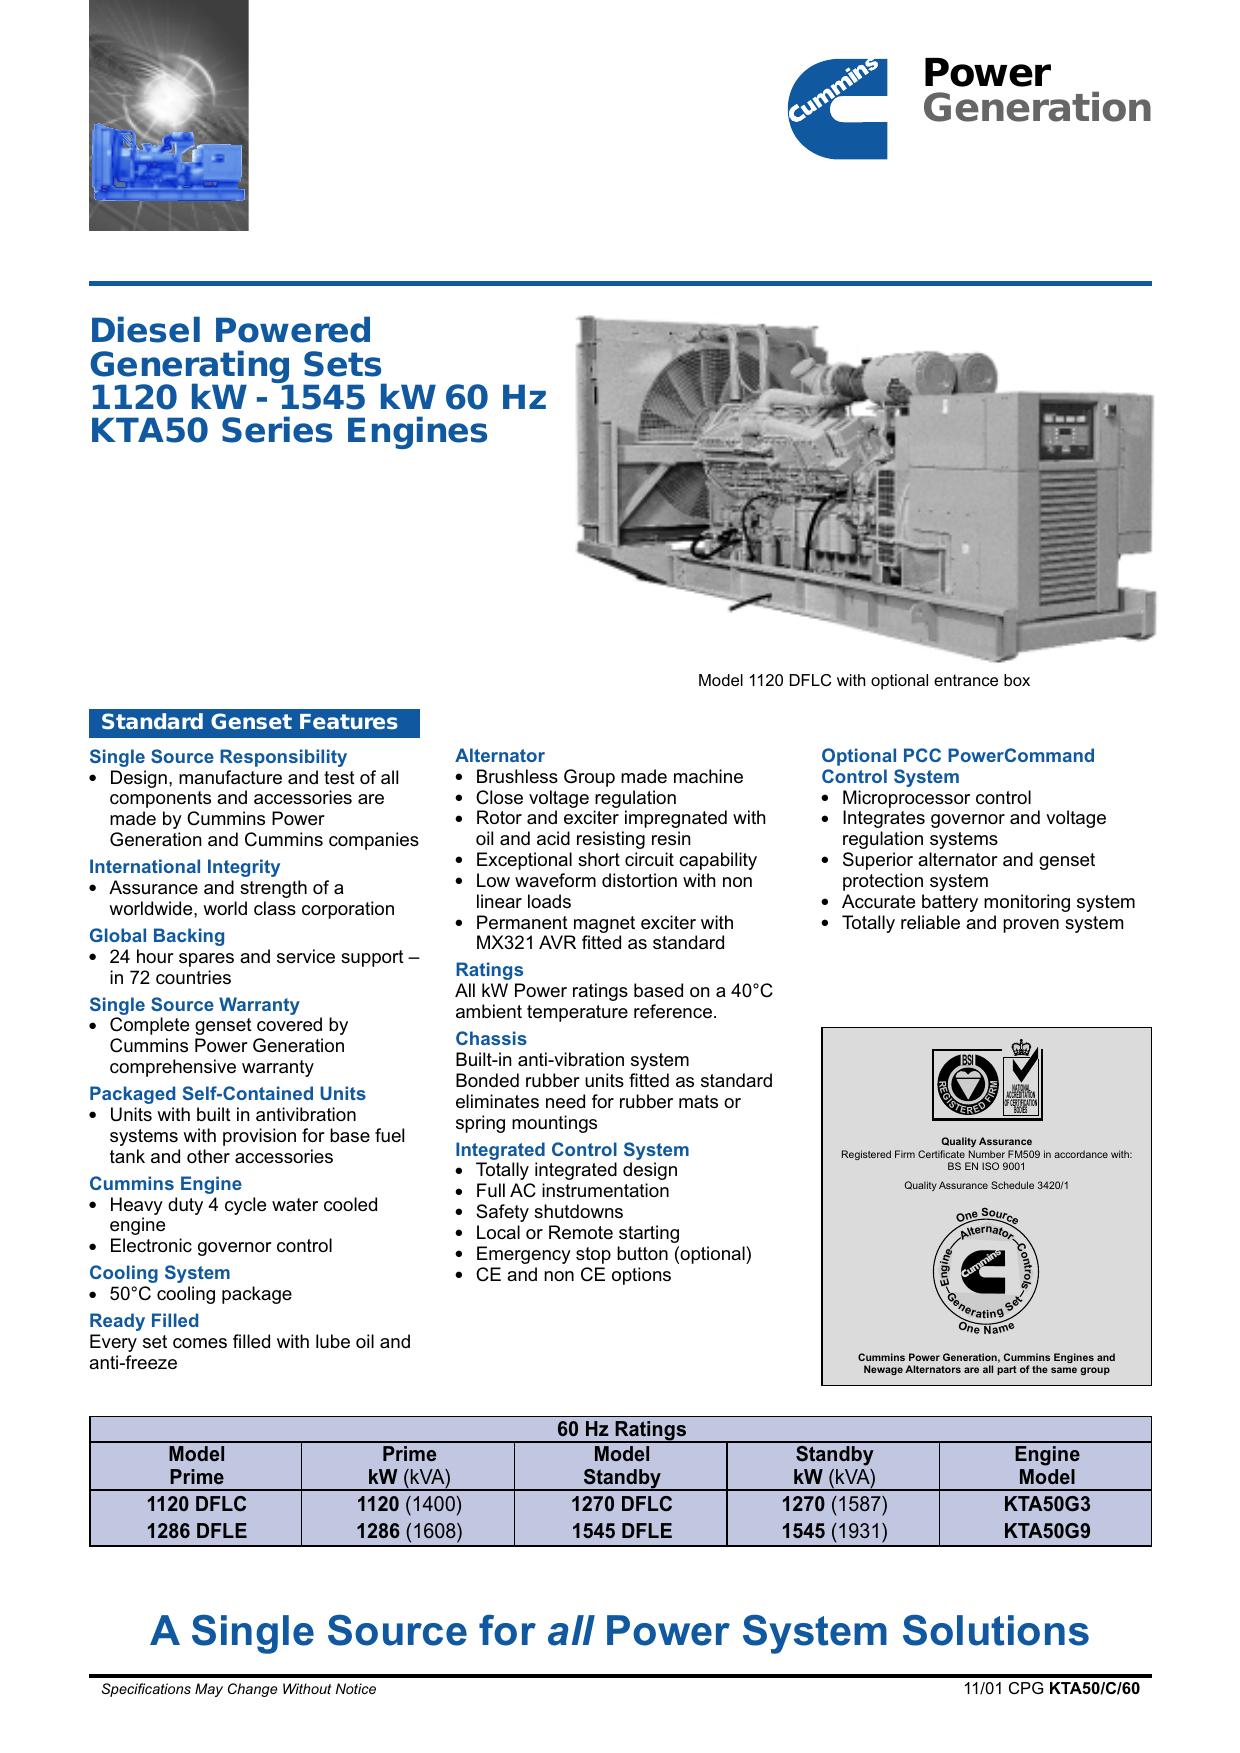 11559 Data Sheet KTA50 (60 Hz)   manualzz com